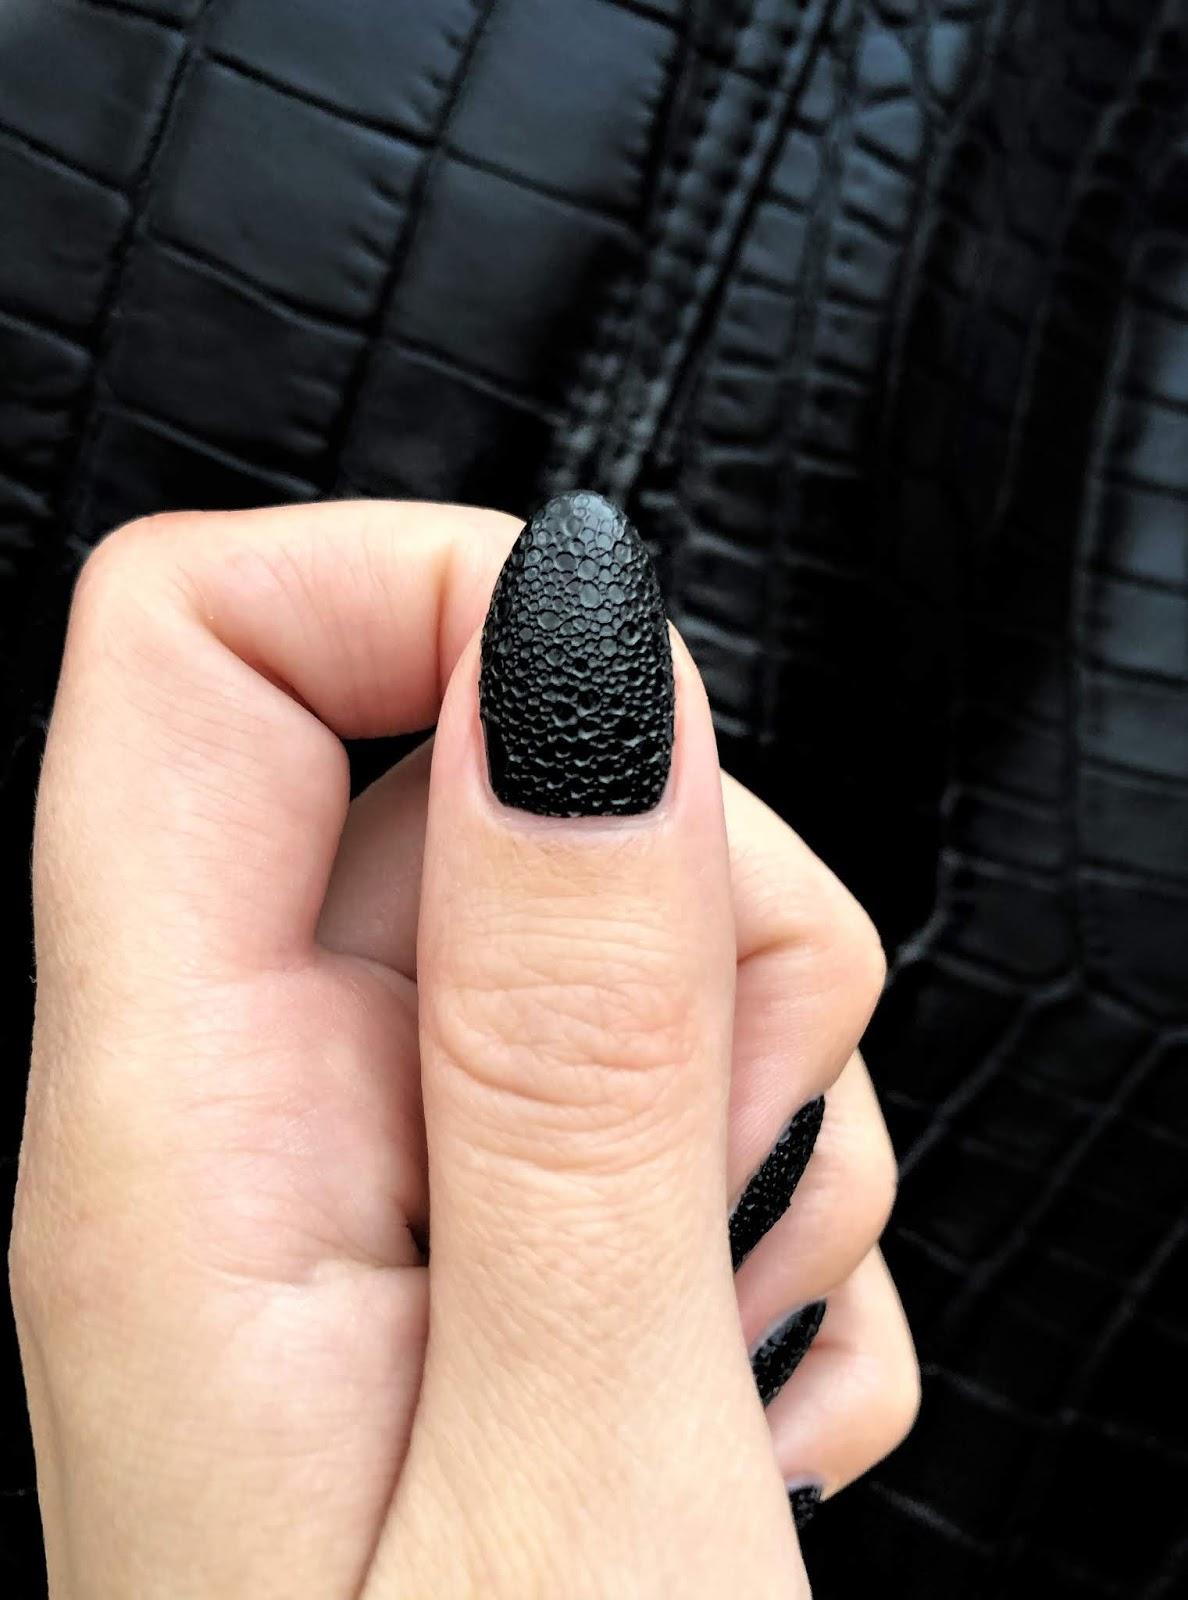 jak-zrobić-bubble-nails-instrukcja-krok-po-kroku